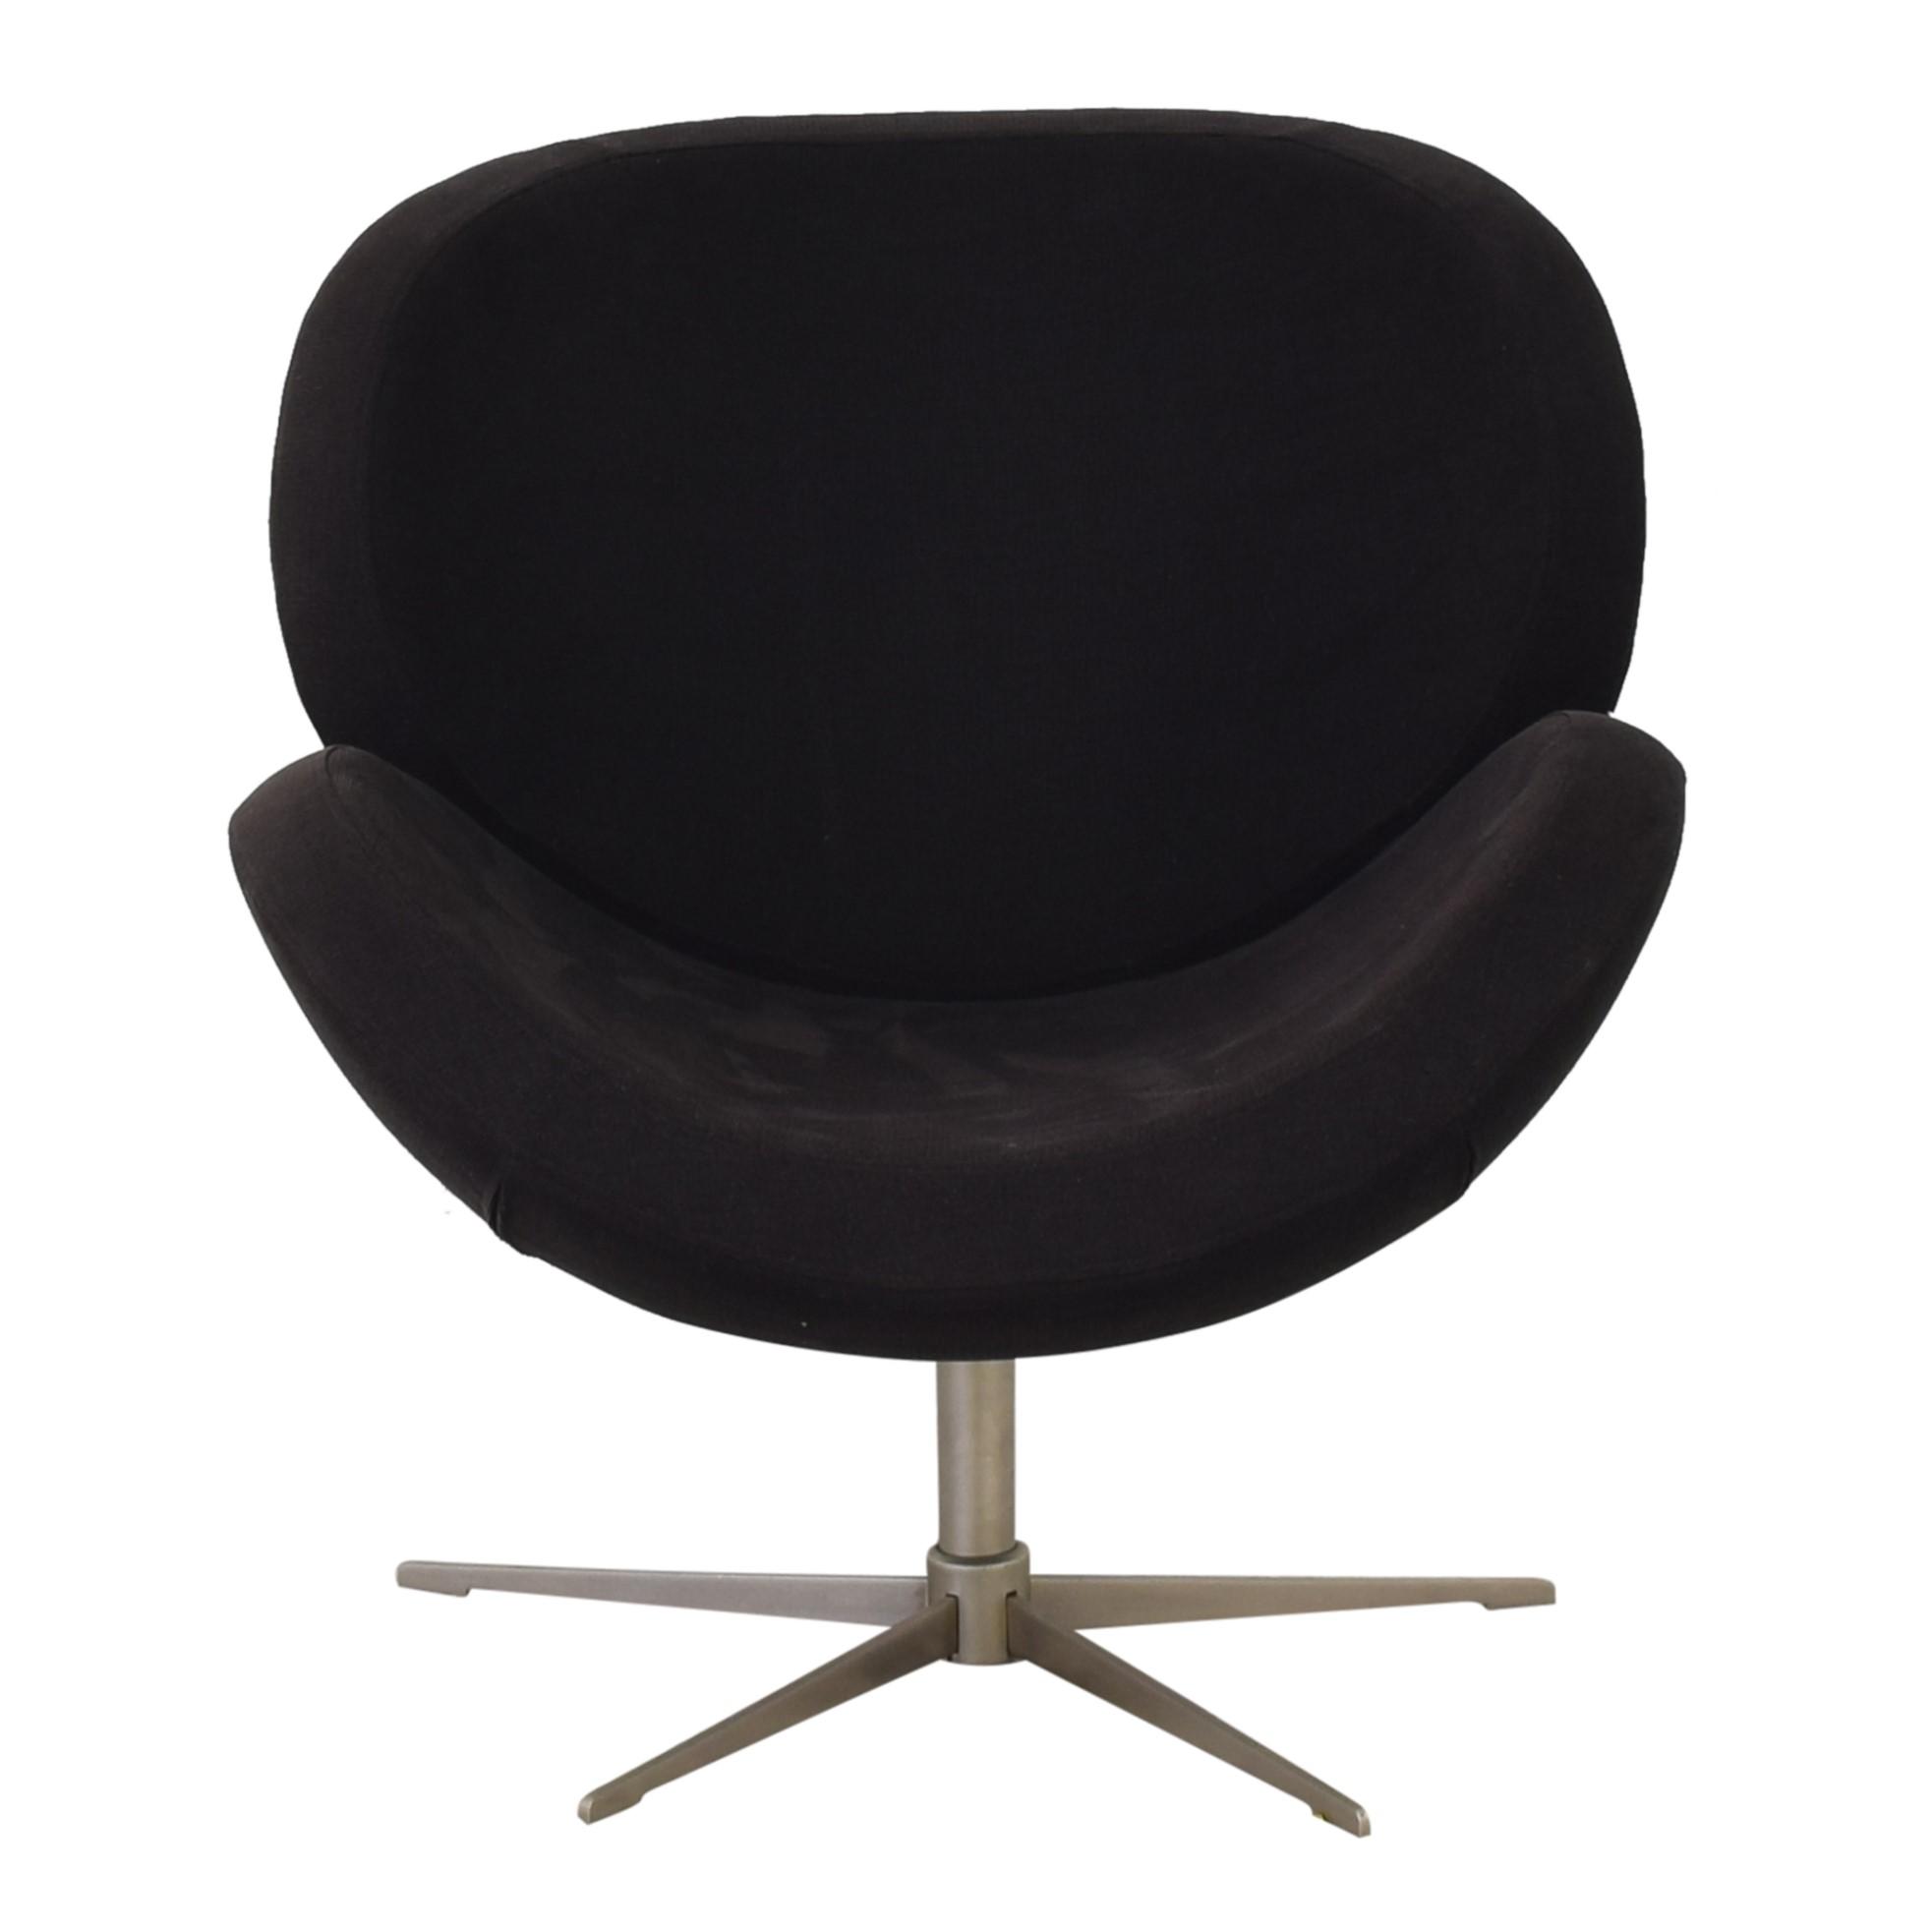 BoConcept BoConcept Swivel Accent Chair second hand